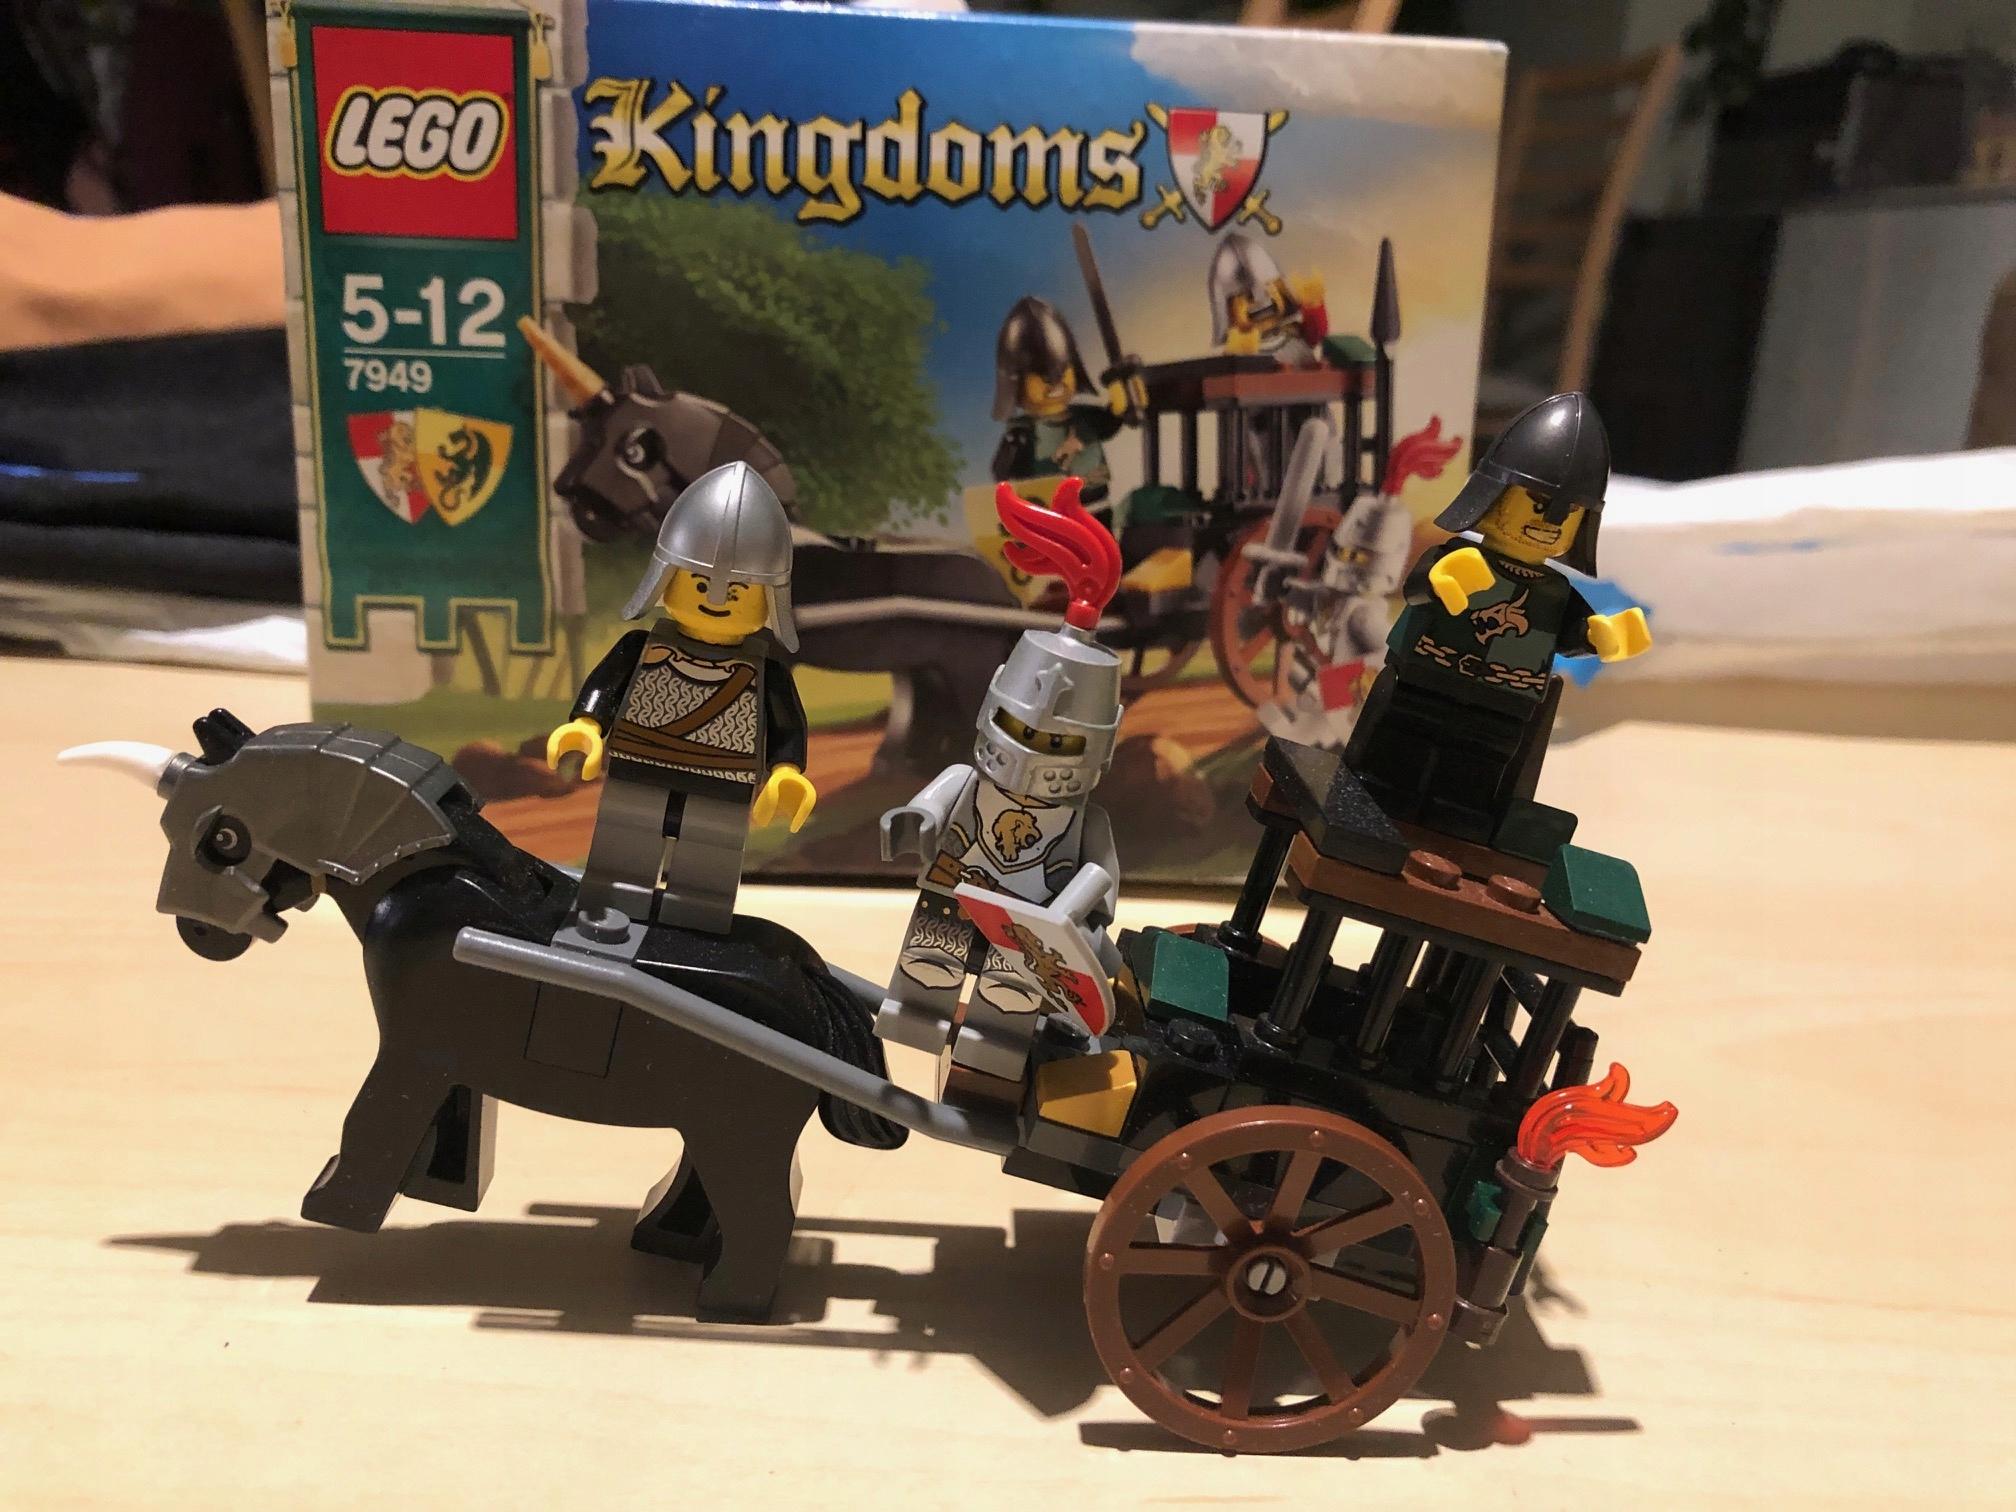 Lego 7949 Kingdoms + GRATIS